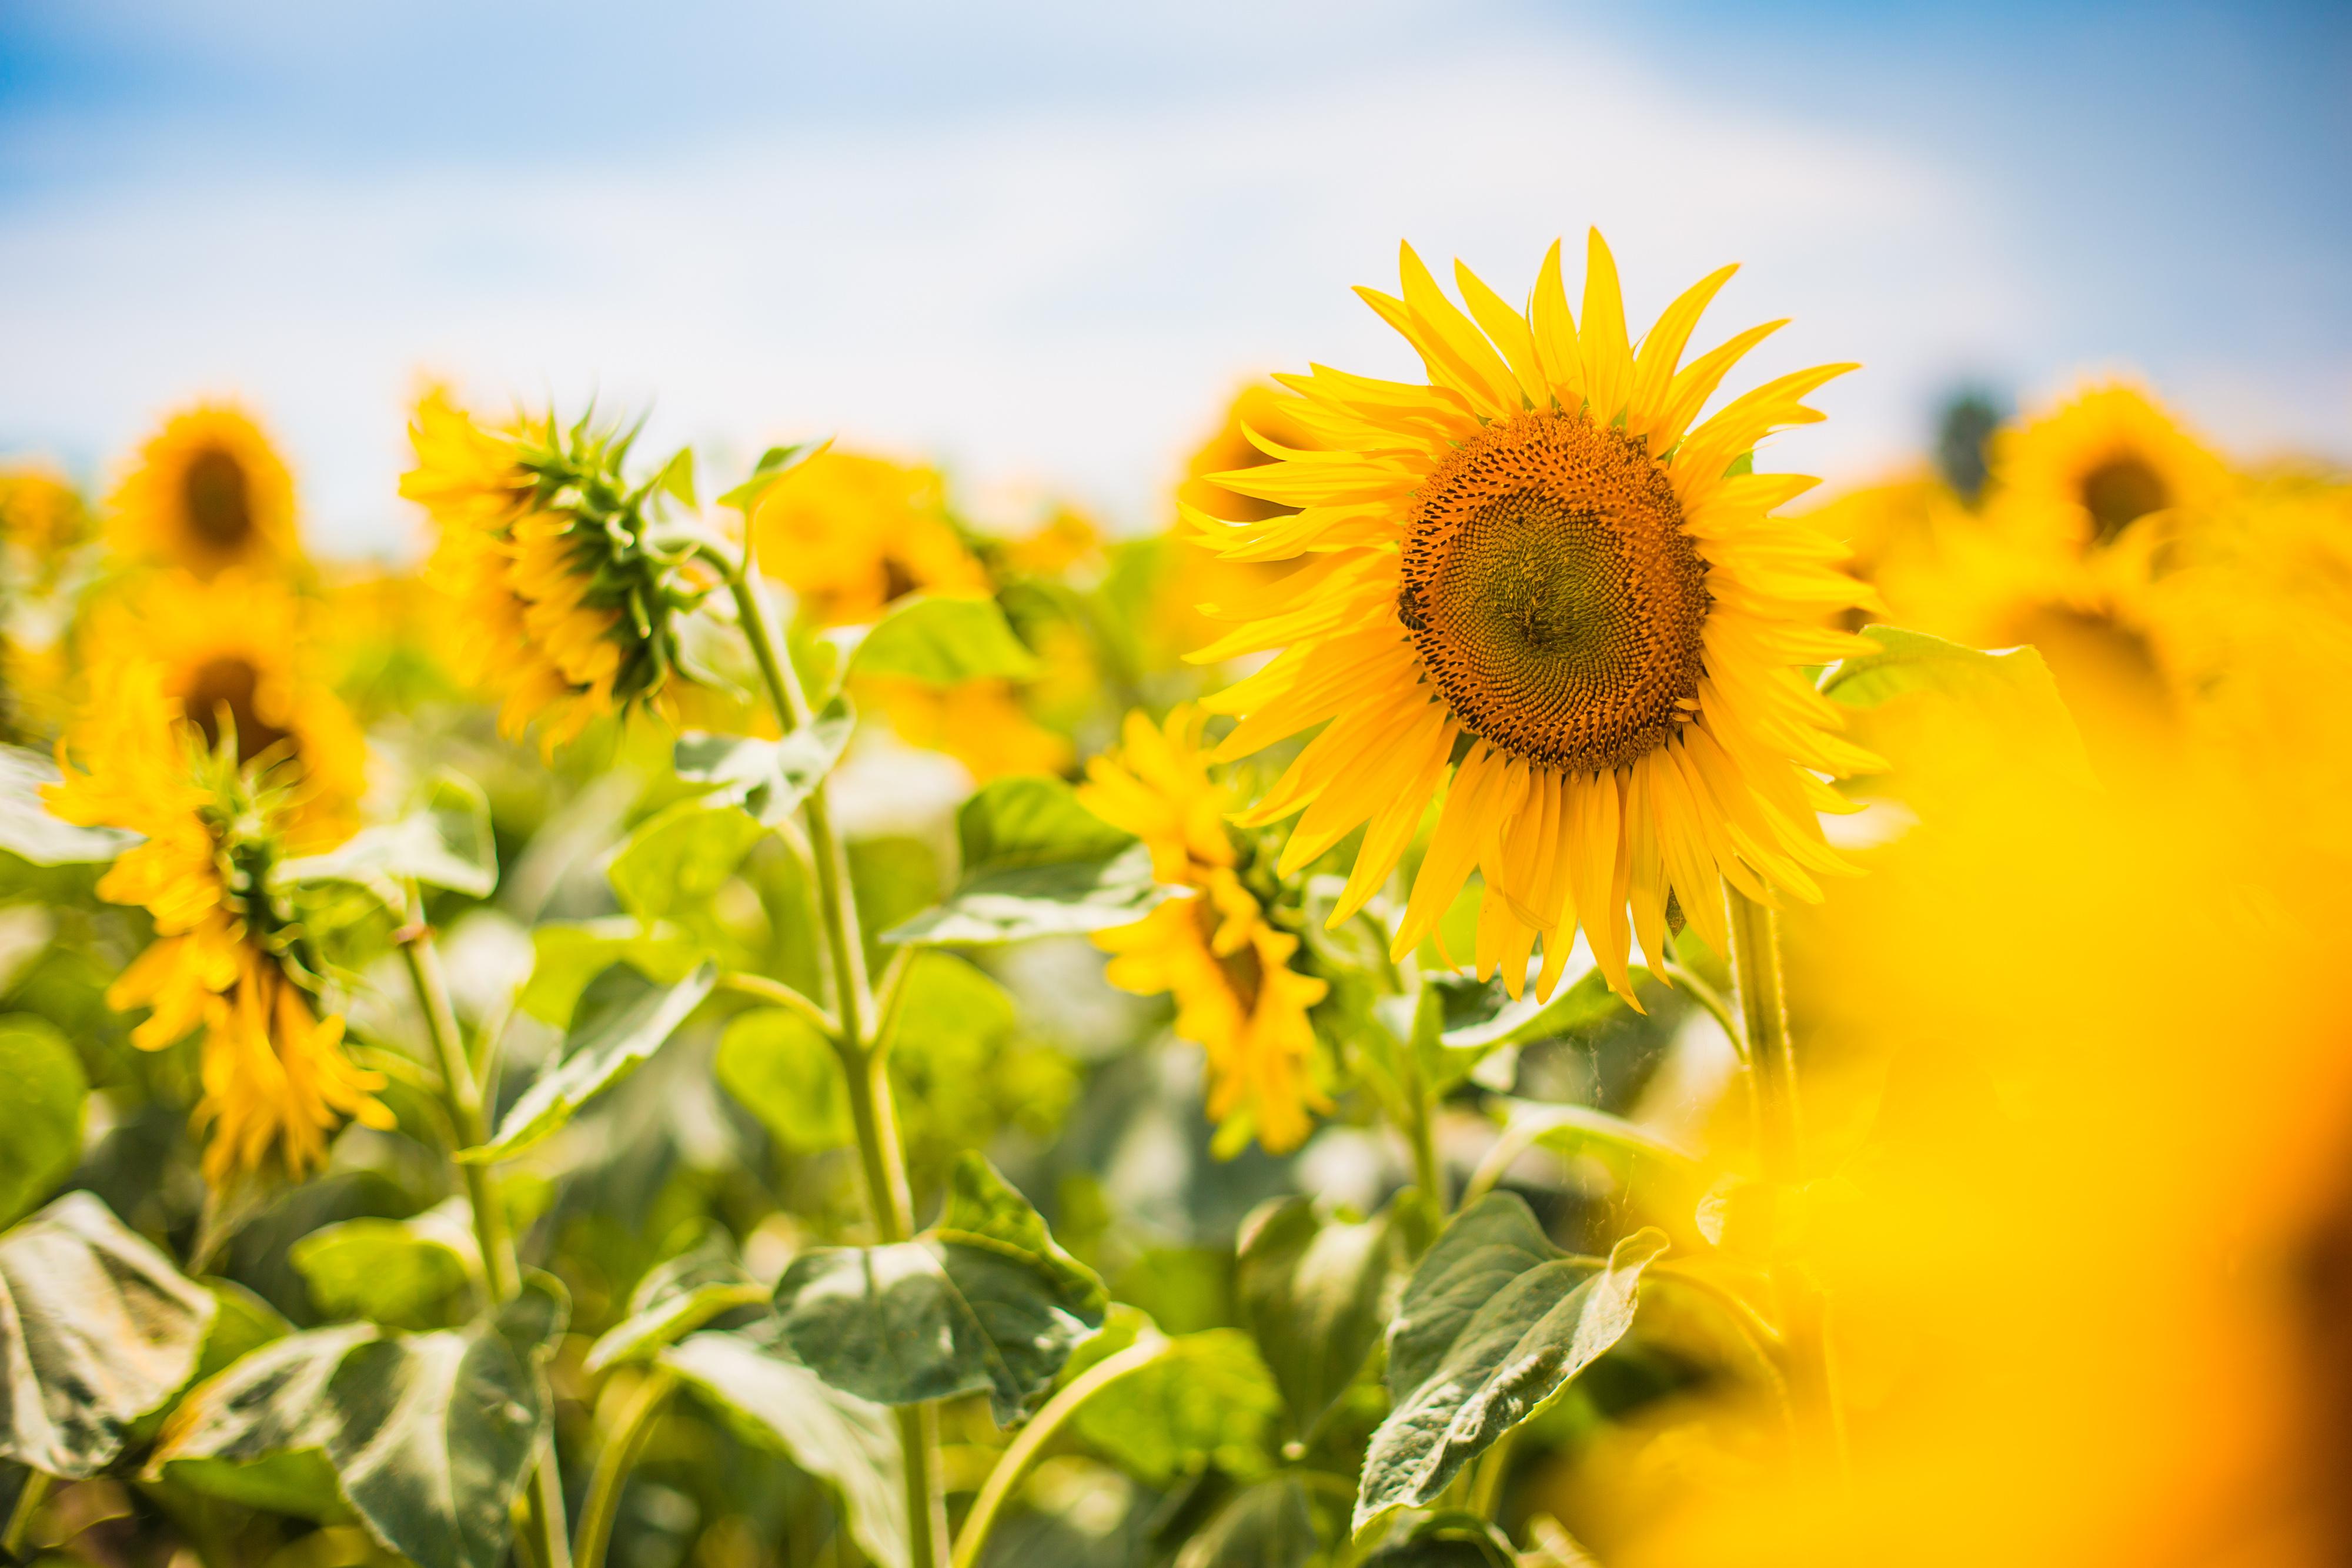 Bright Yellow Sunflowers 4k Ultra HD Wallpaper ...